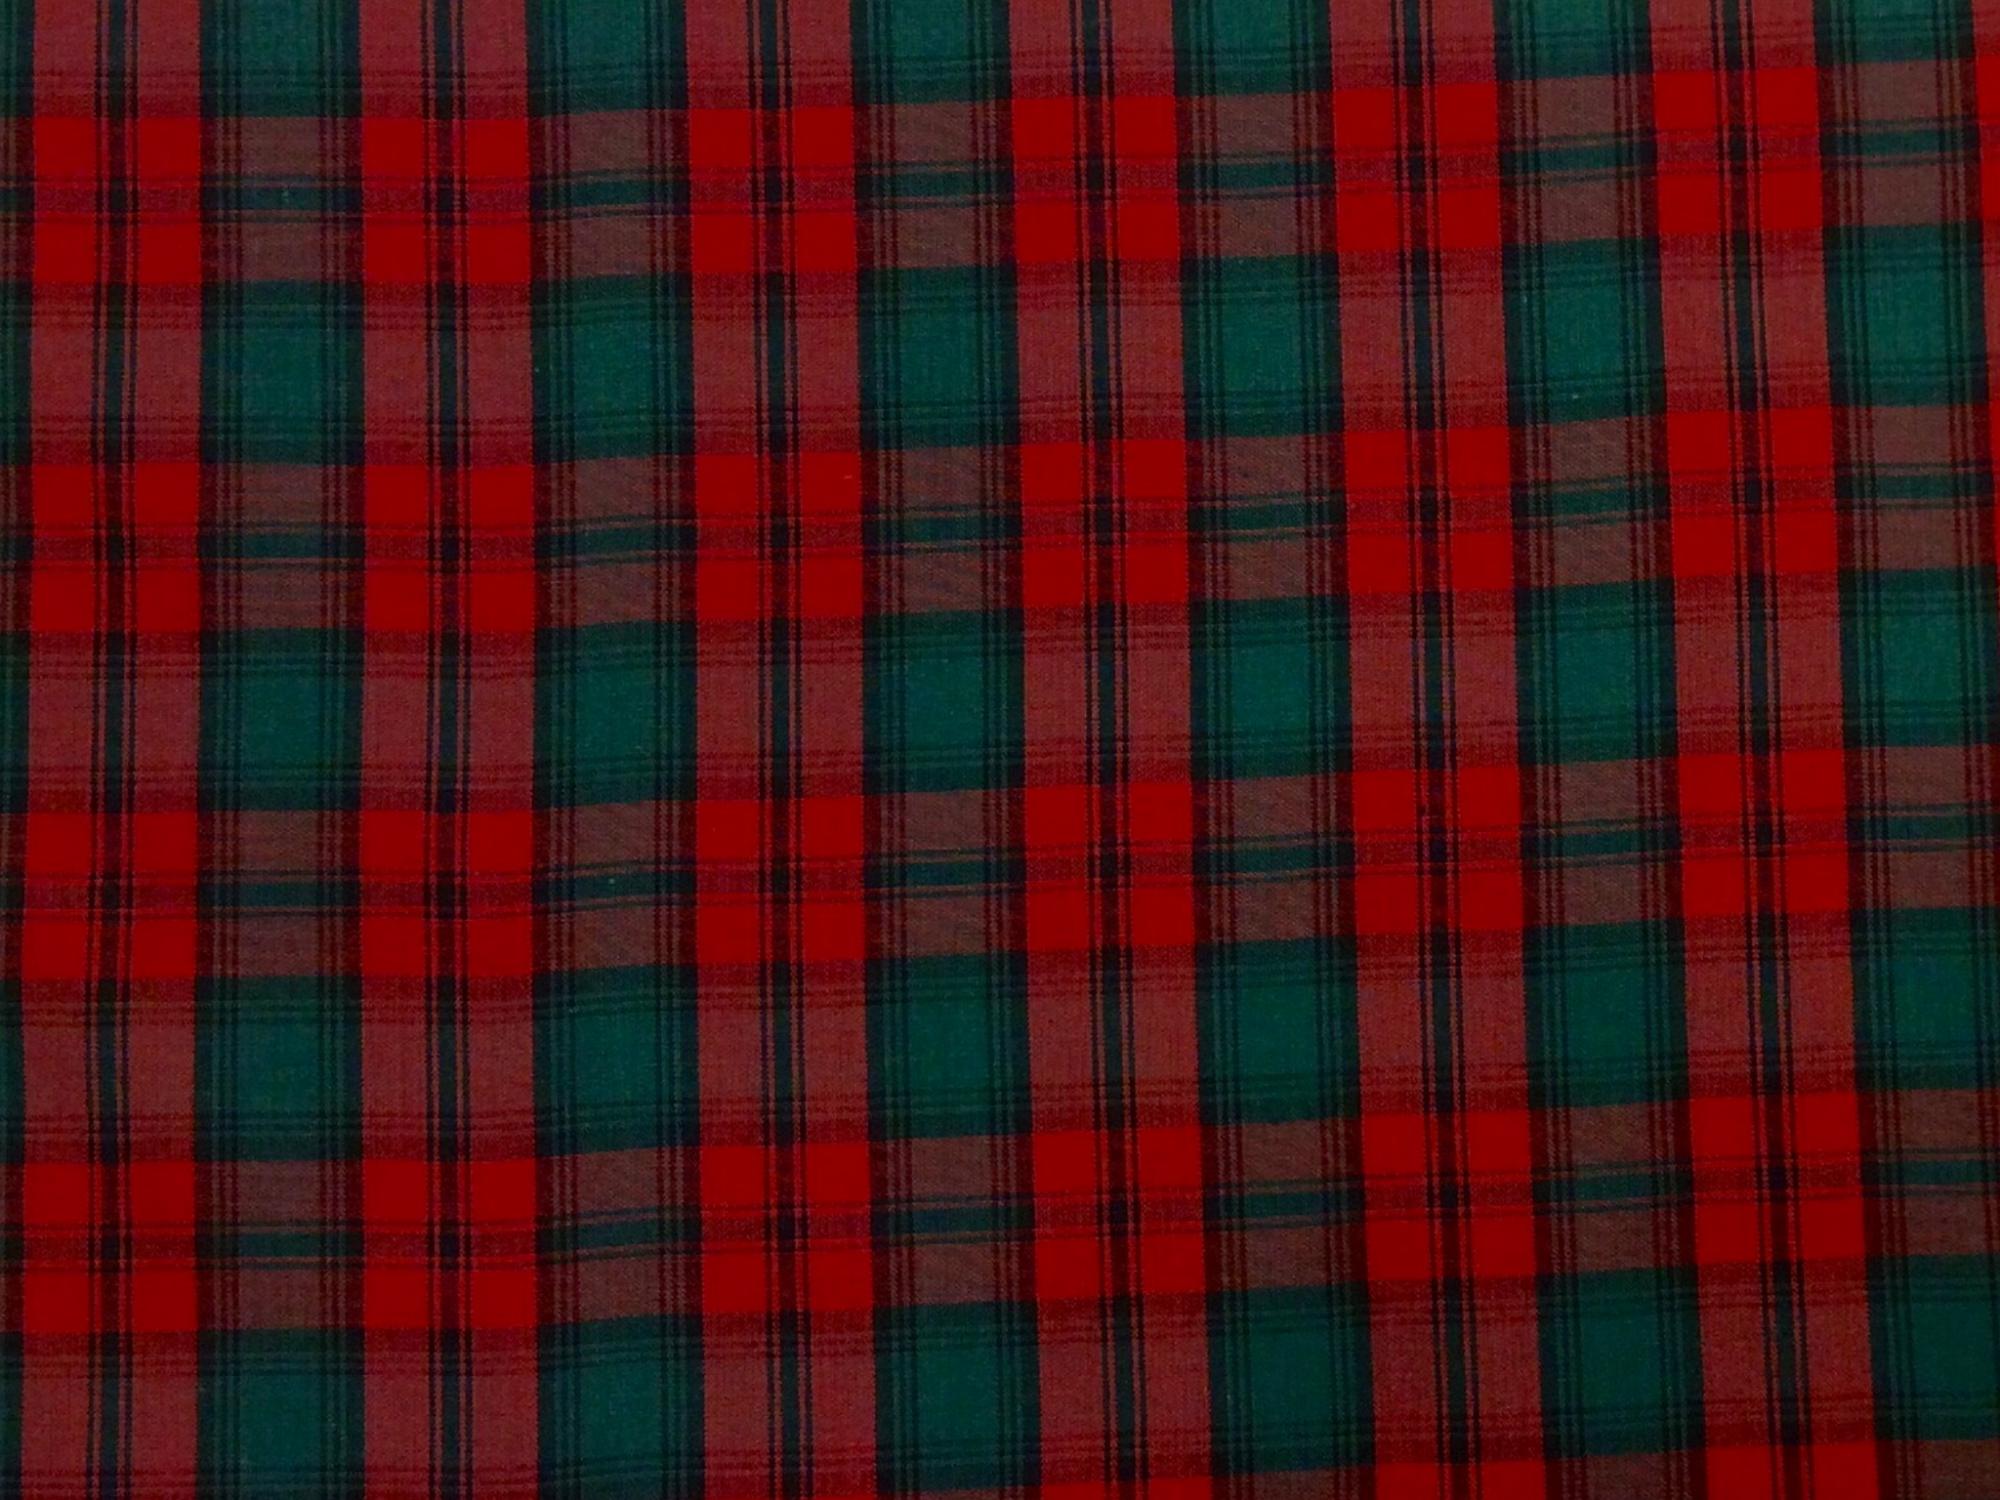 Tartan Plaid Brodie Clan Apparel Fabric Yarn Dyed Fabric FTP04